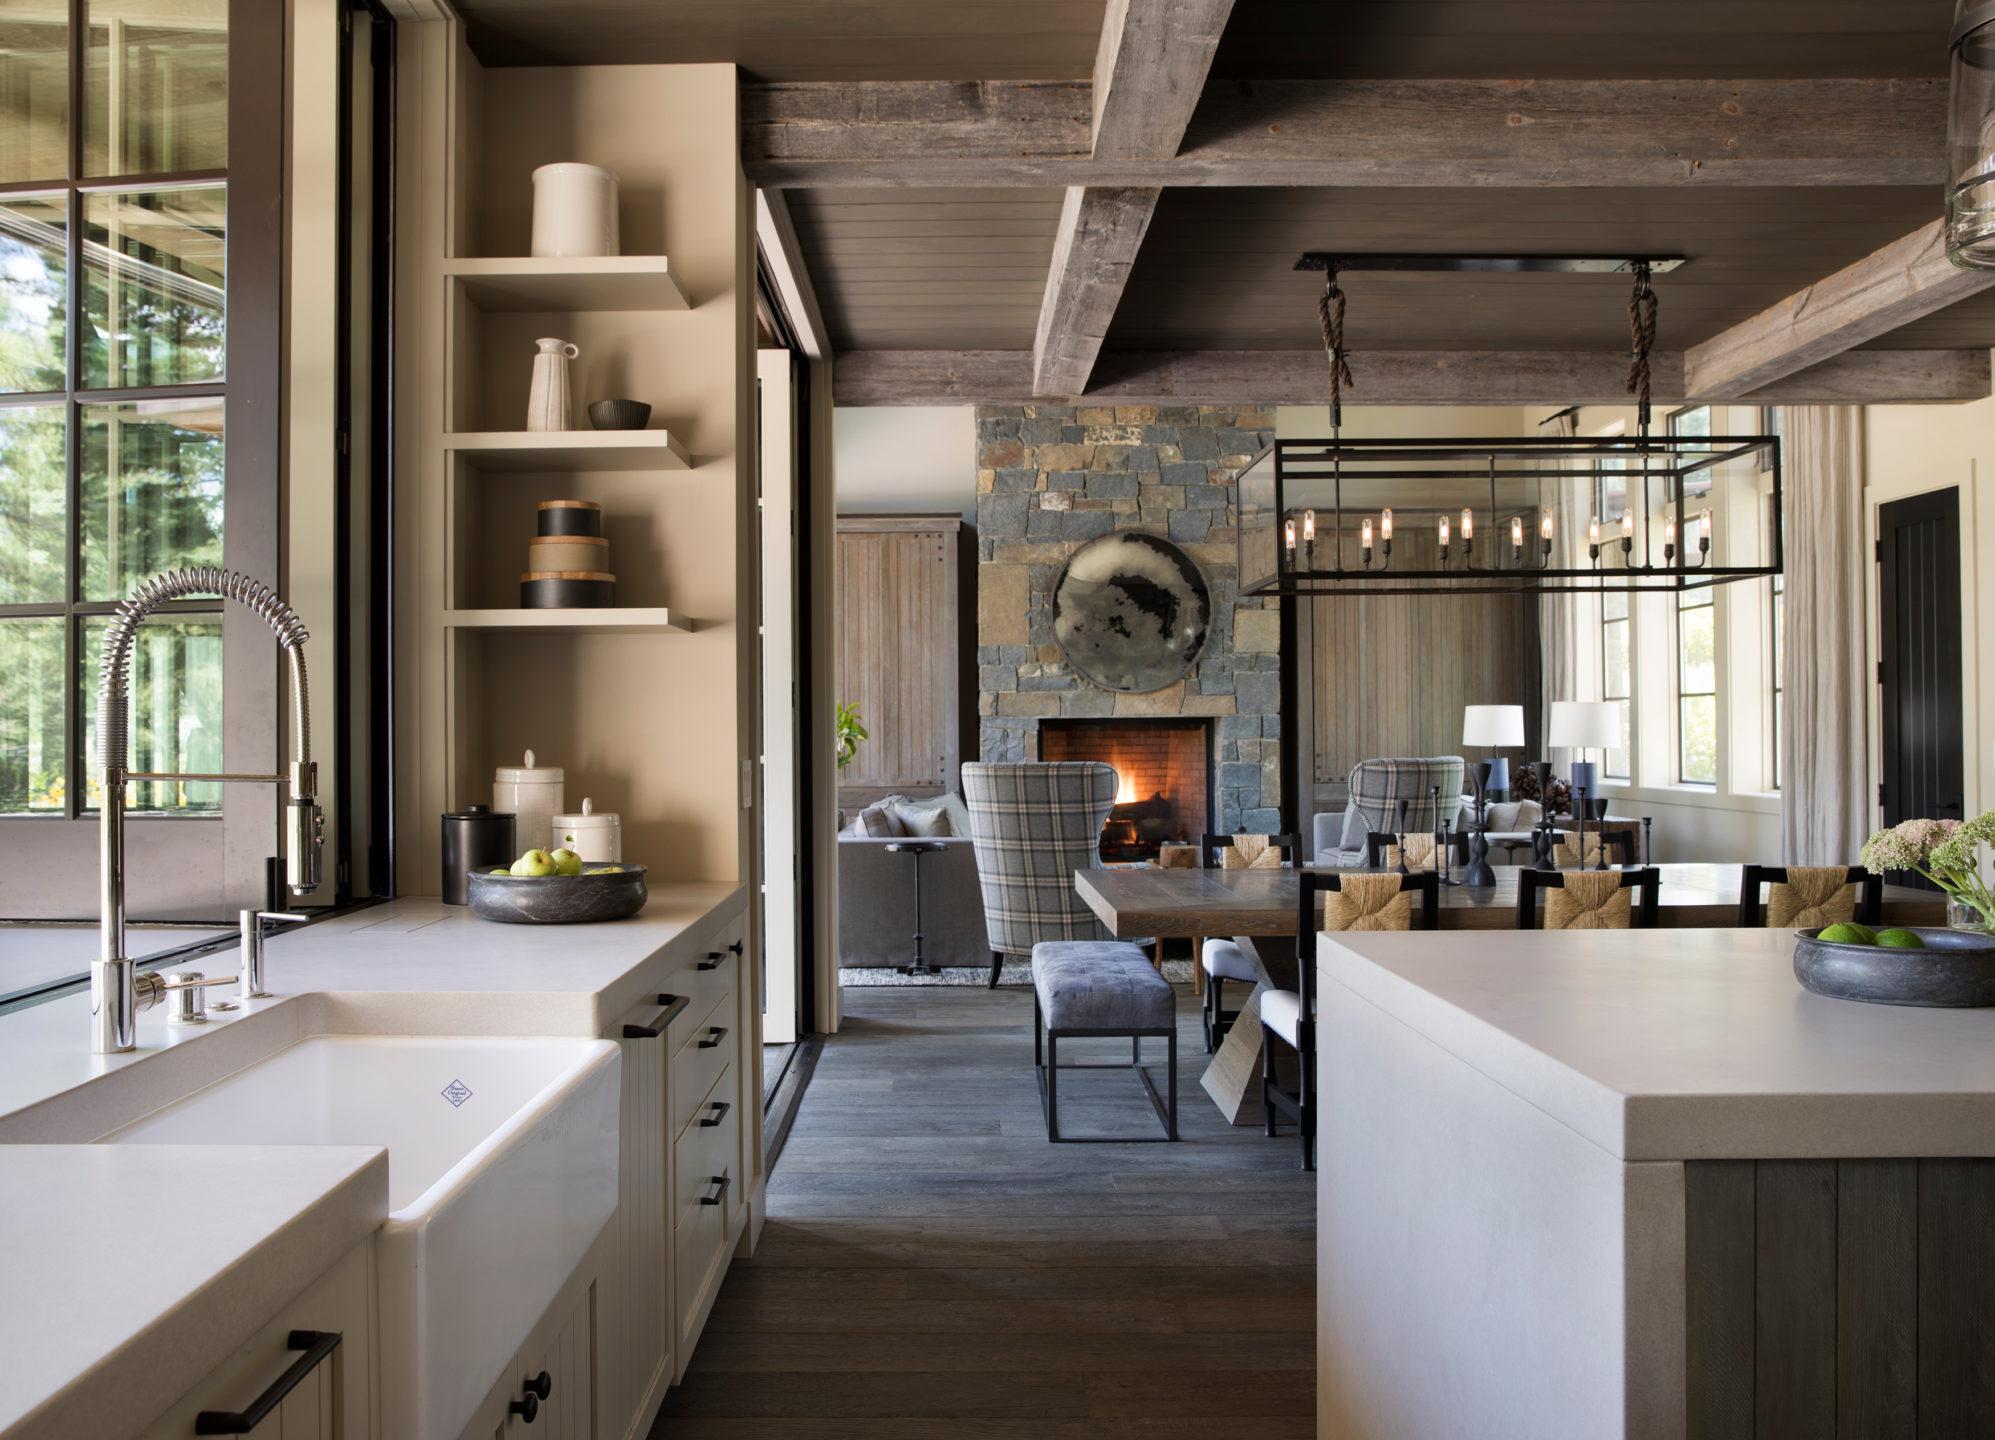 Jennifer_robins_interiors_projects_martis_camp_Del_Grand_04_HR_kithcnen_living_room_LR